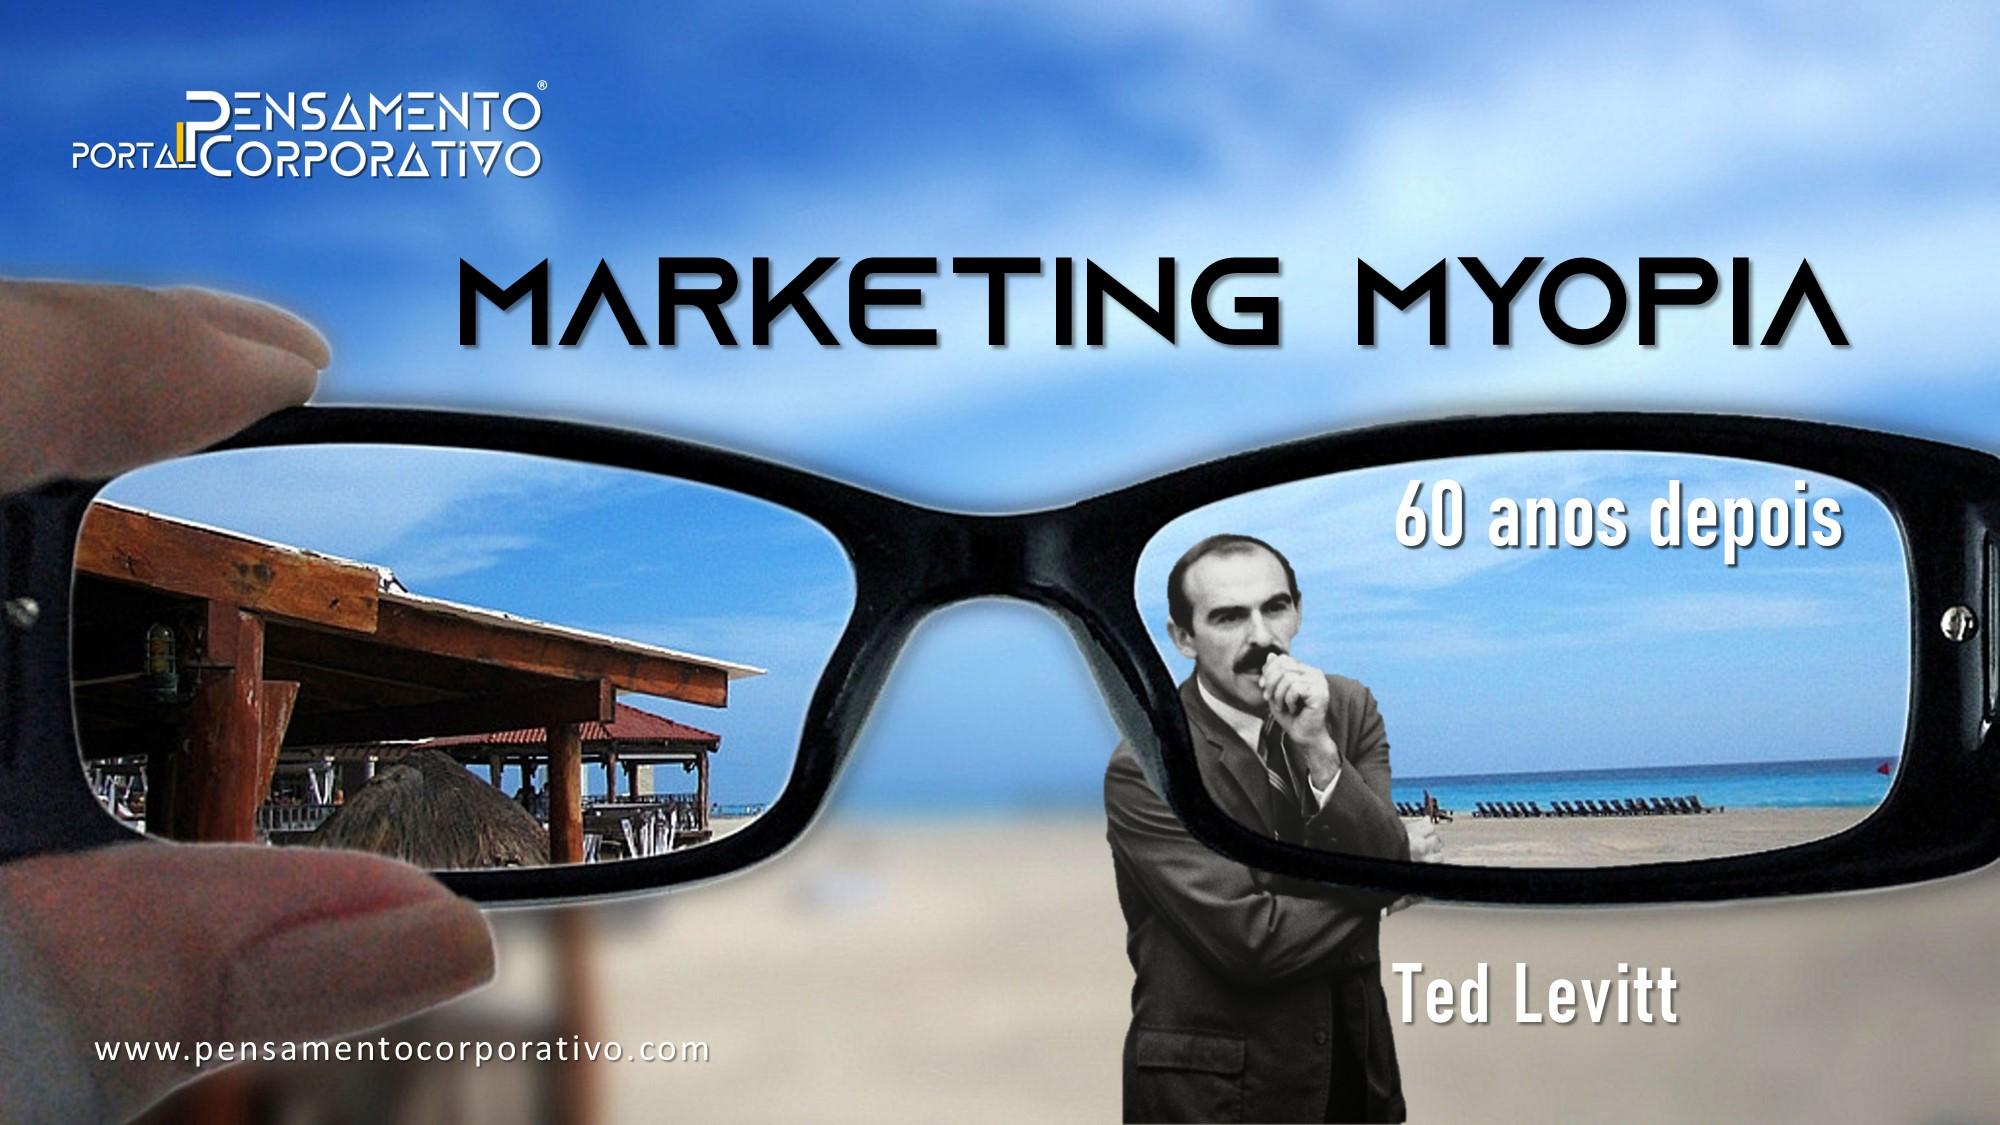 ted levitt marketing myopia